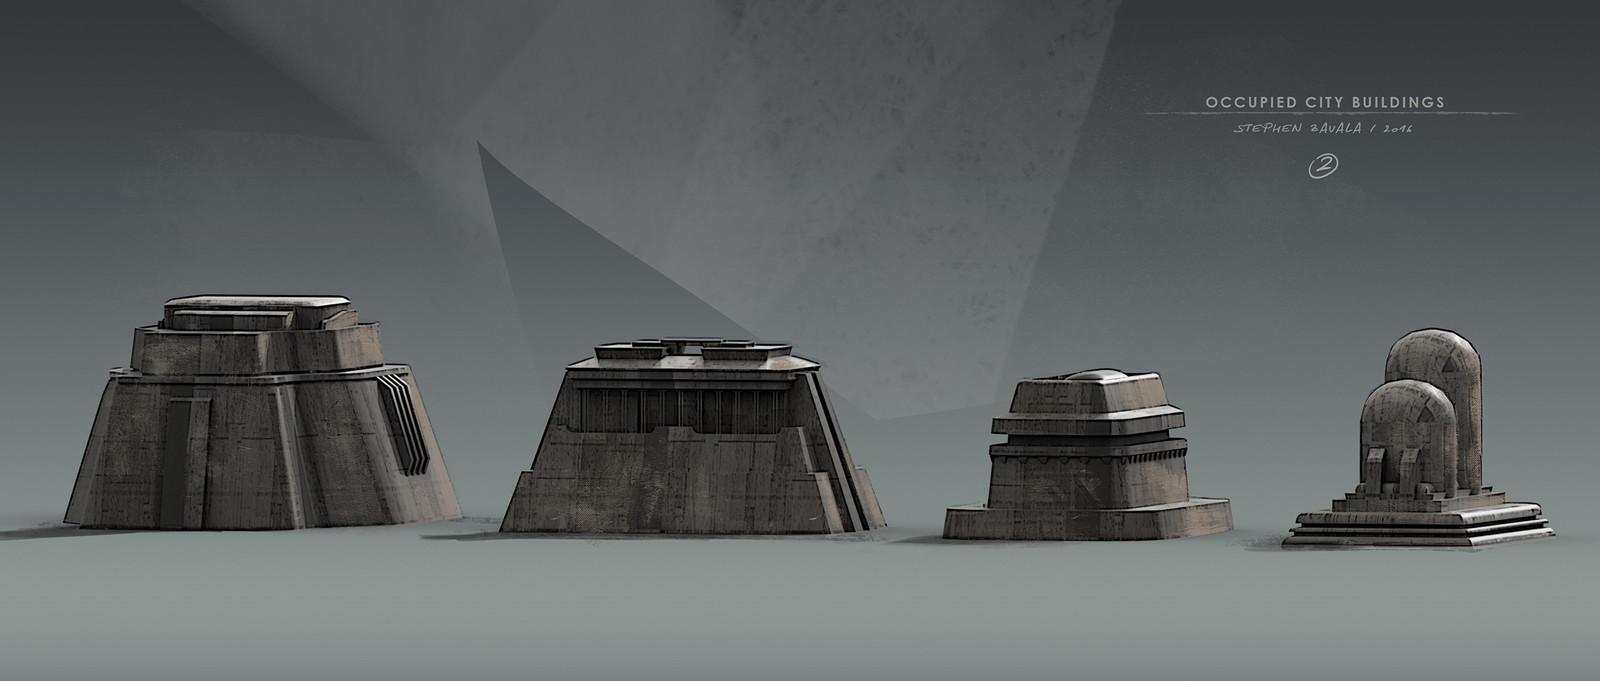 3rd tier buildings